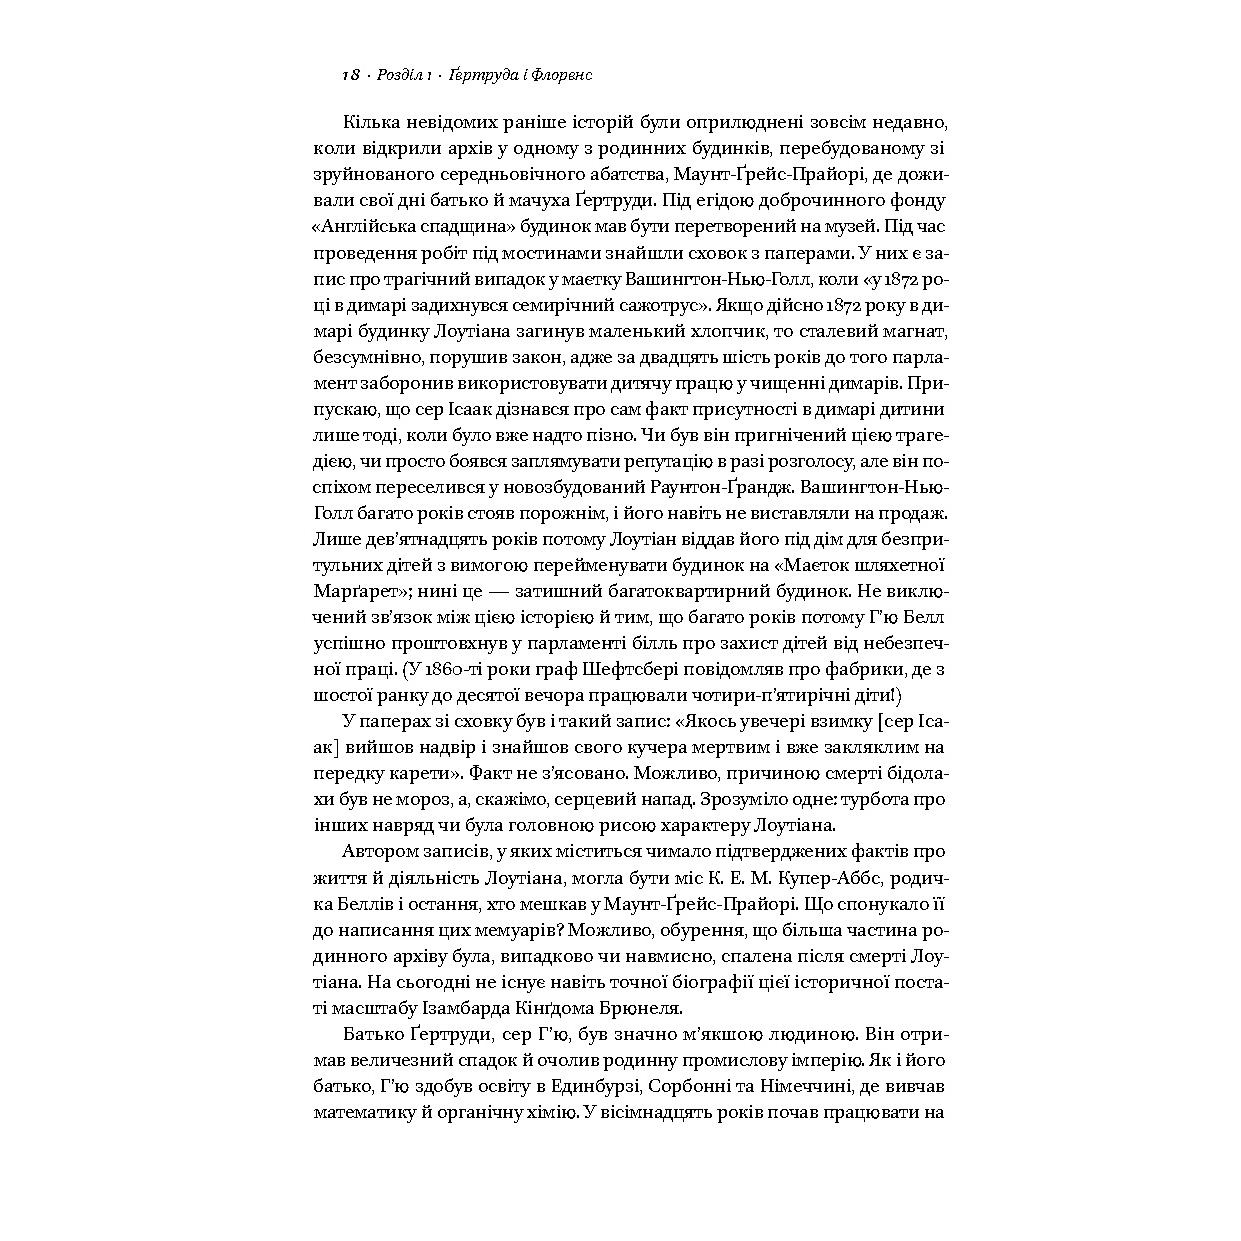 069_howell-georgina_koroleva-pusteli06